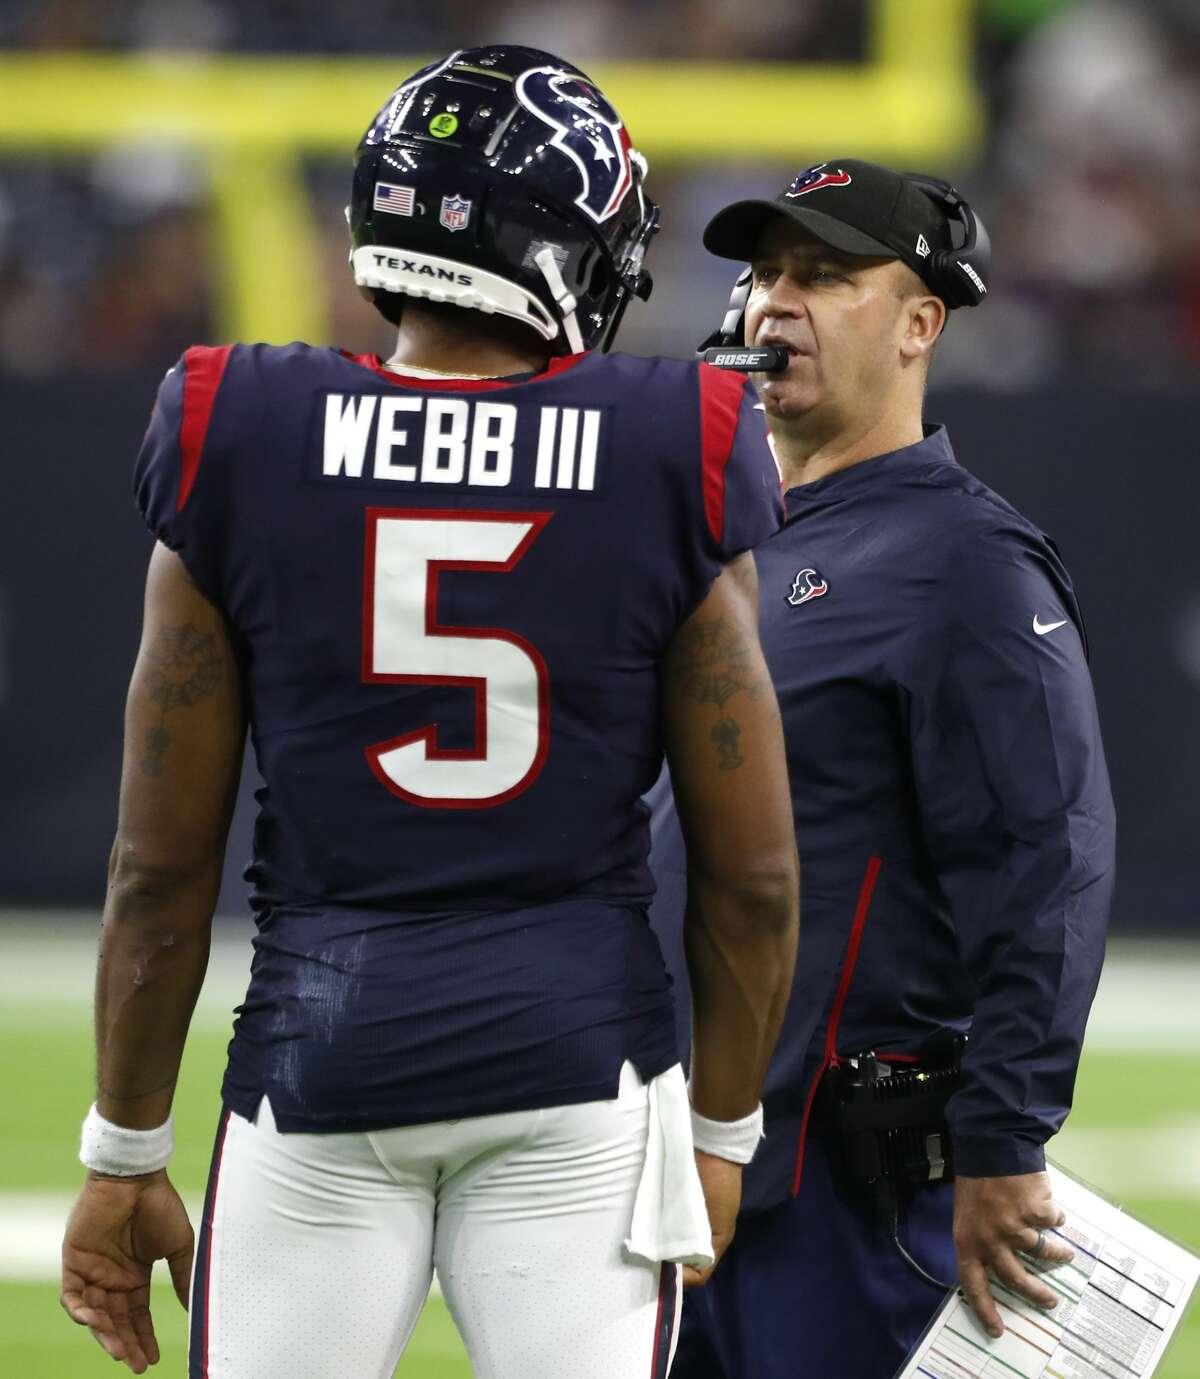 Houston Texans head coach Bill O'Brien talks to quarterback Joe Webb (5) during the fourth quarter of an NFL preseason football game against the Dallas Cowboys at NRG Stadiumon Thursday, Aug. 30, 2018, in Houston.